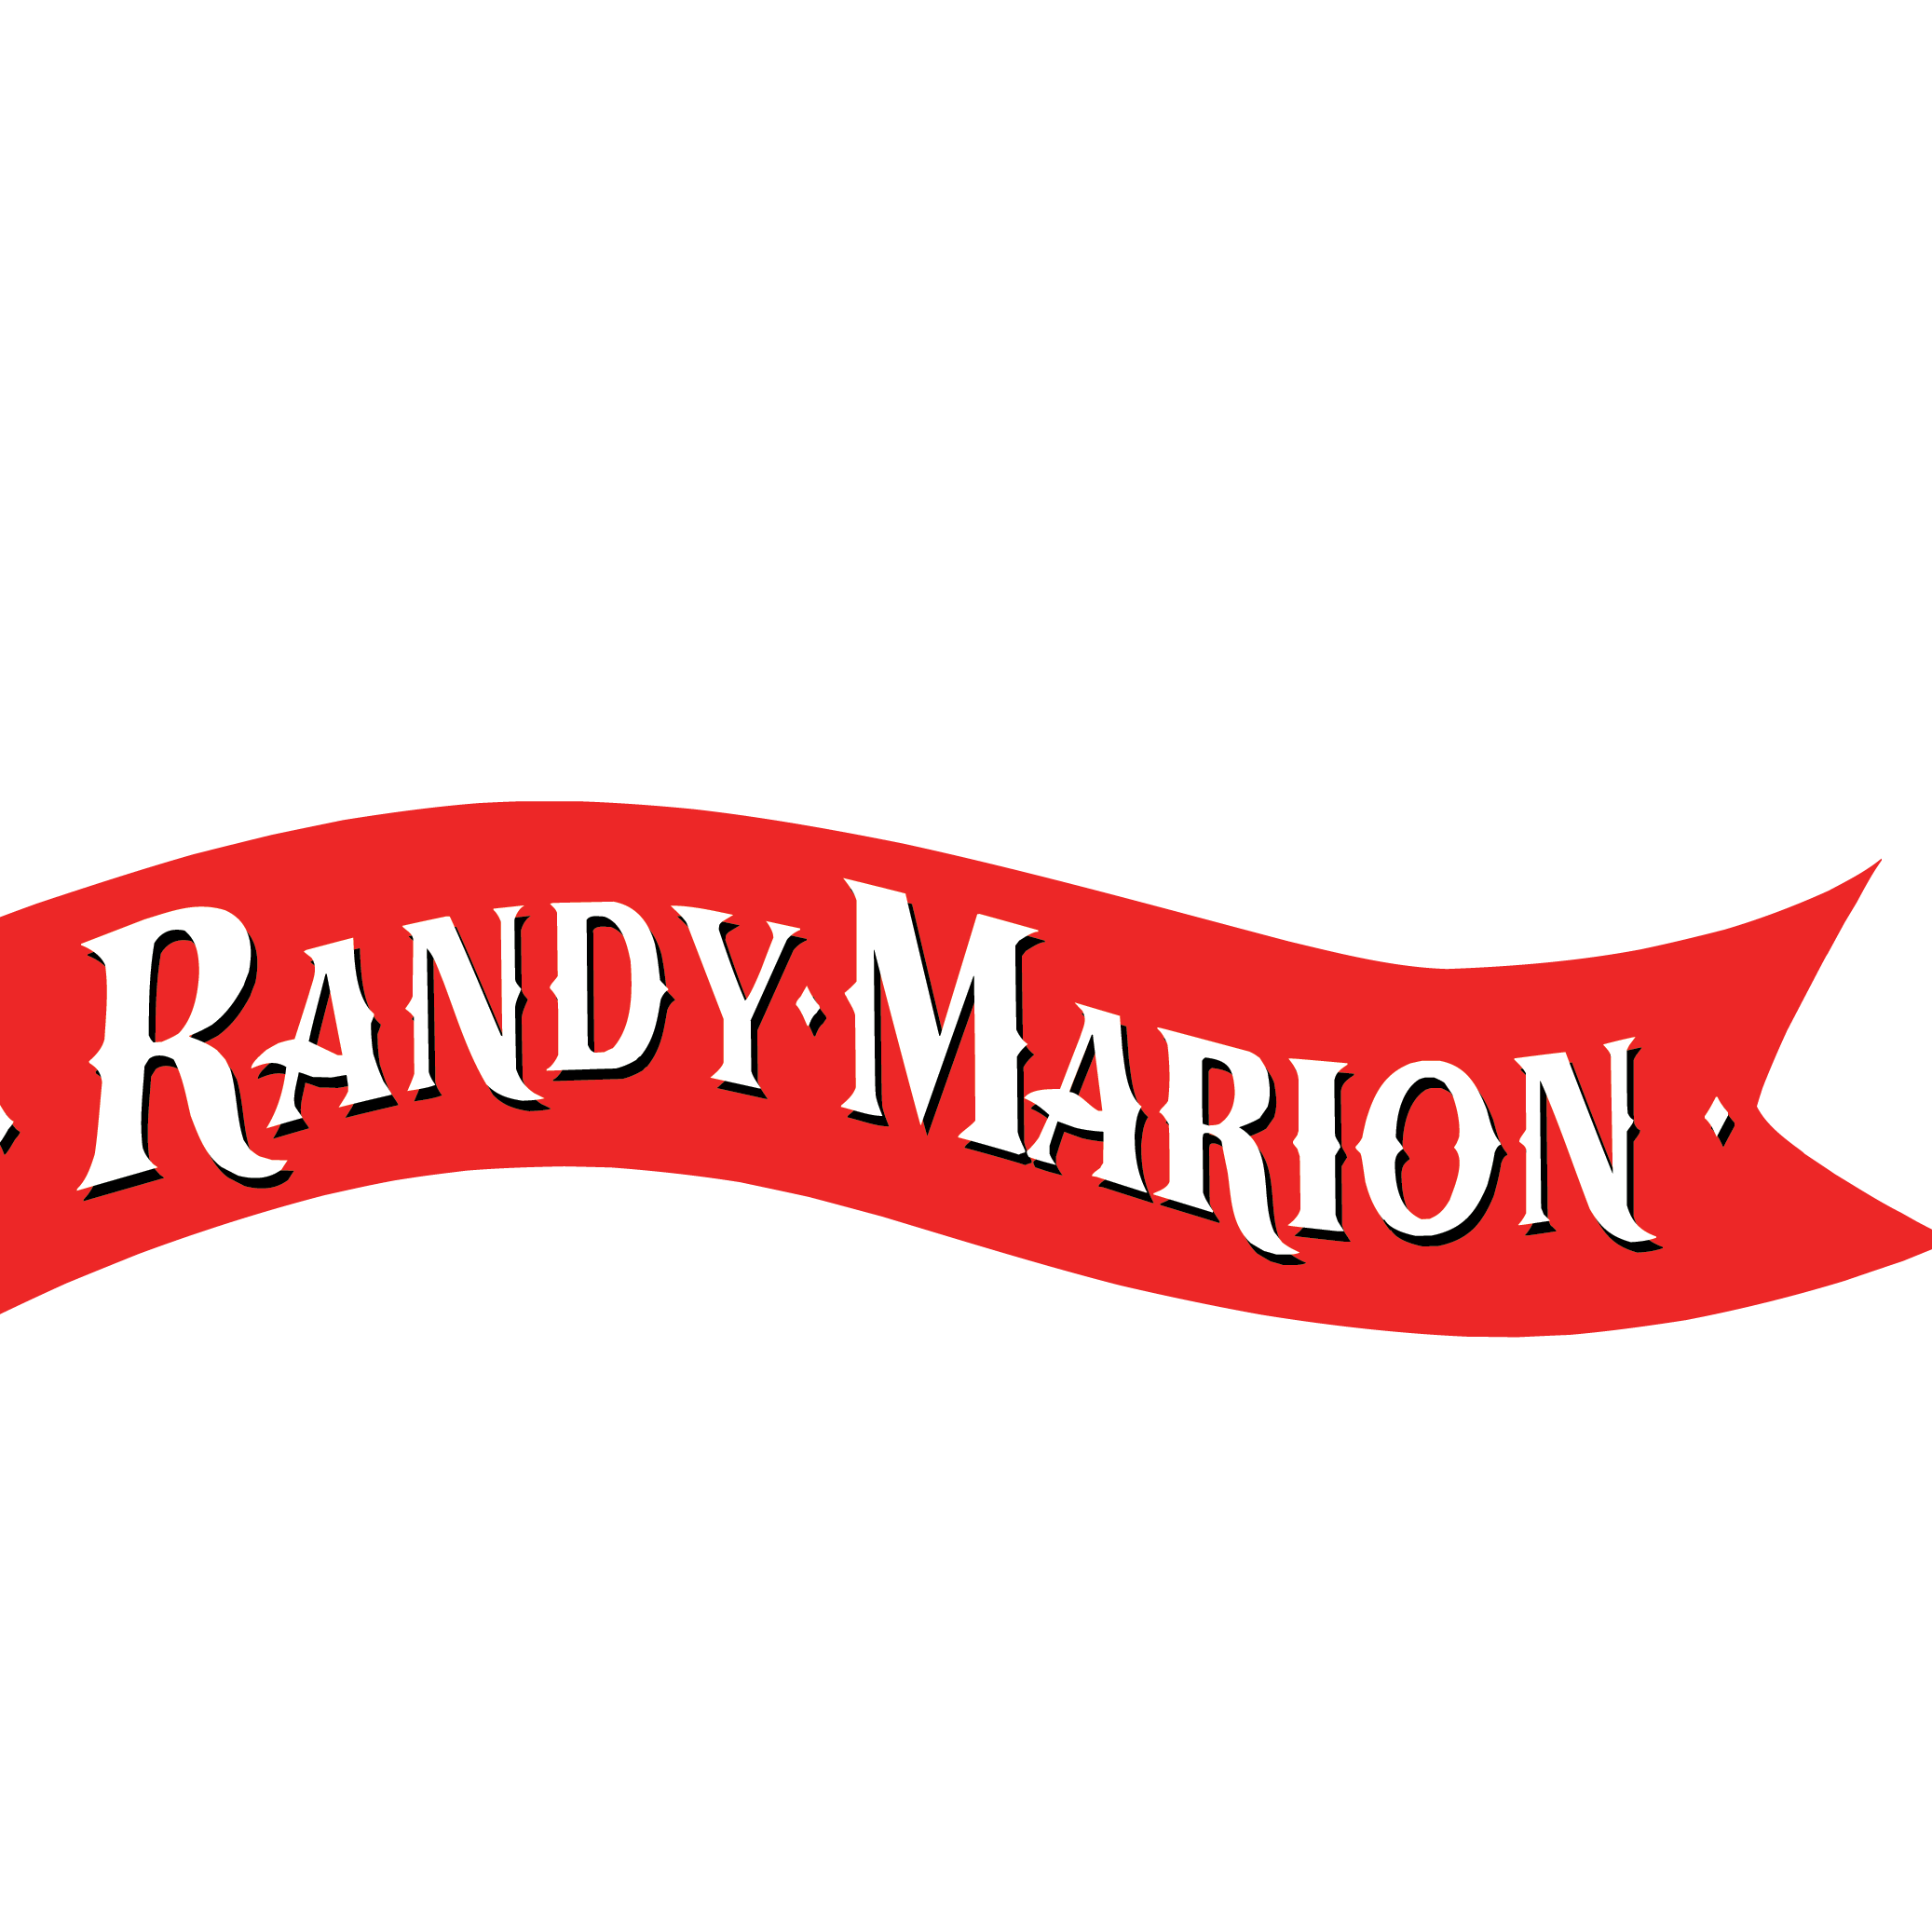 Randy Marion Buick GMC Truck in Huntersville NC